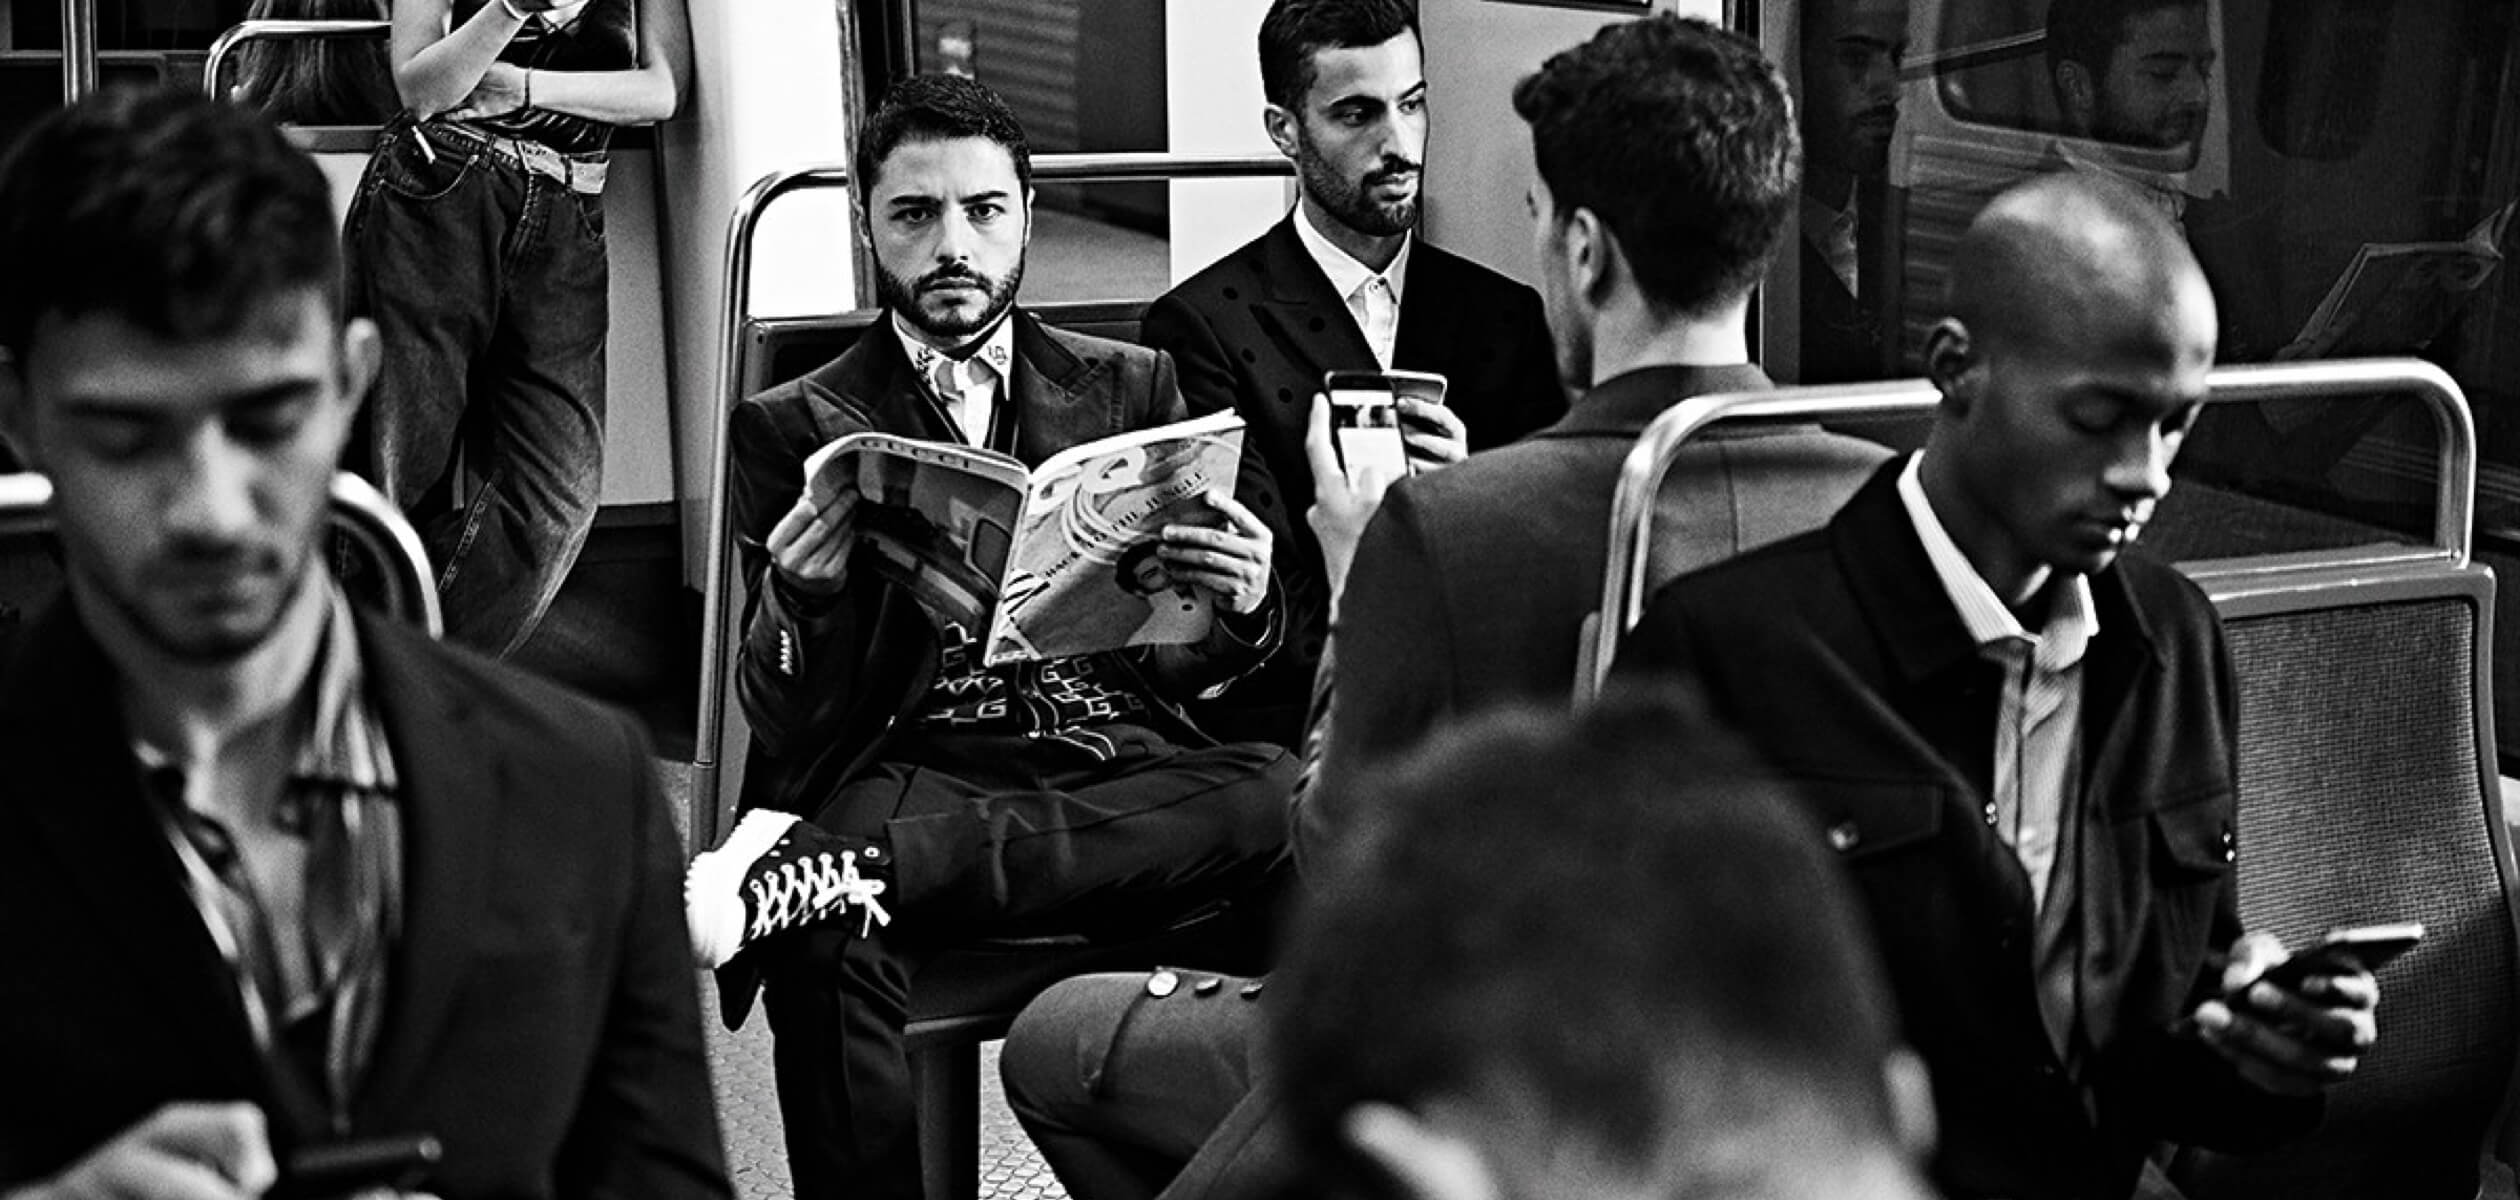 Черно-белое фото мужчин в костюмах, сидящих в метро. У одно в руках журнал GQ